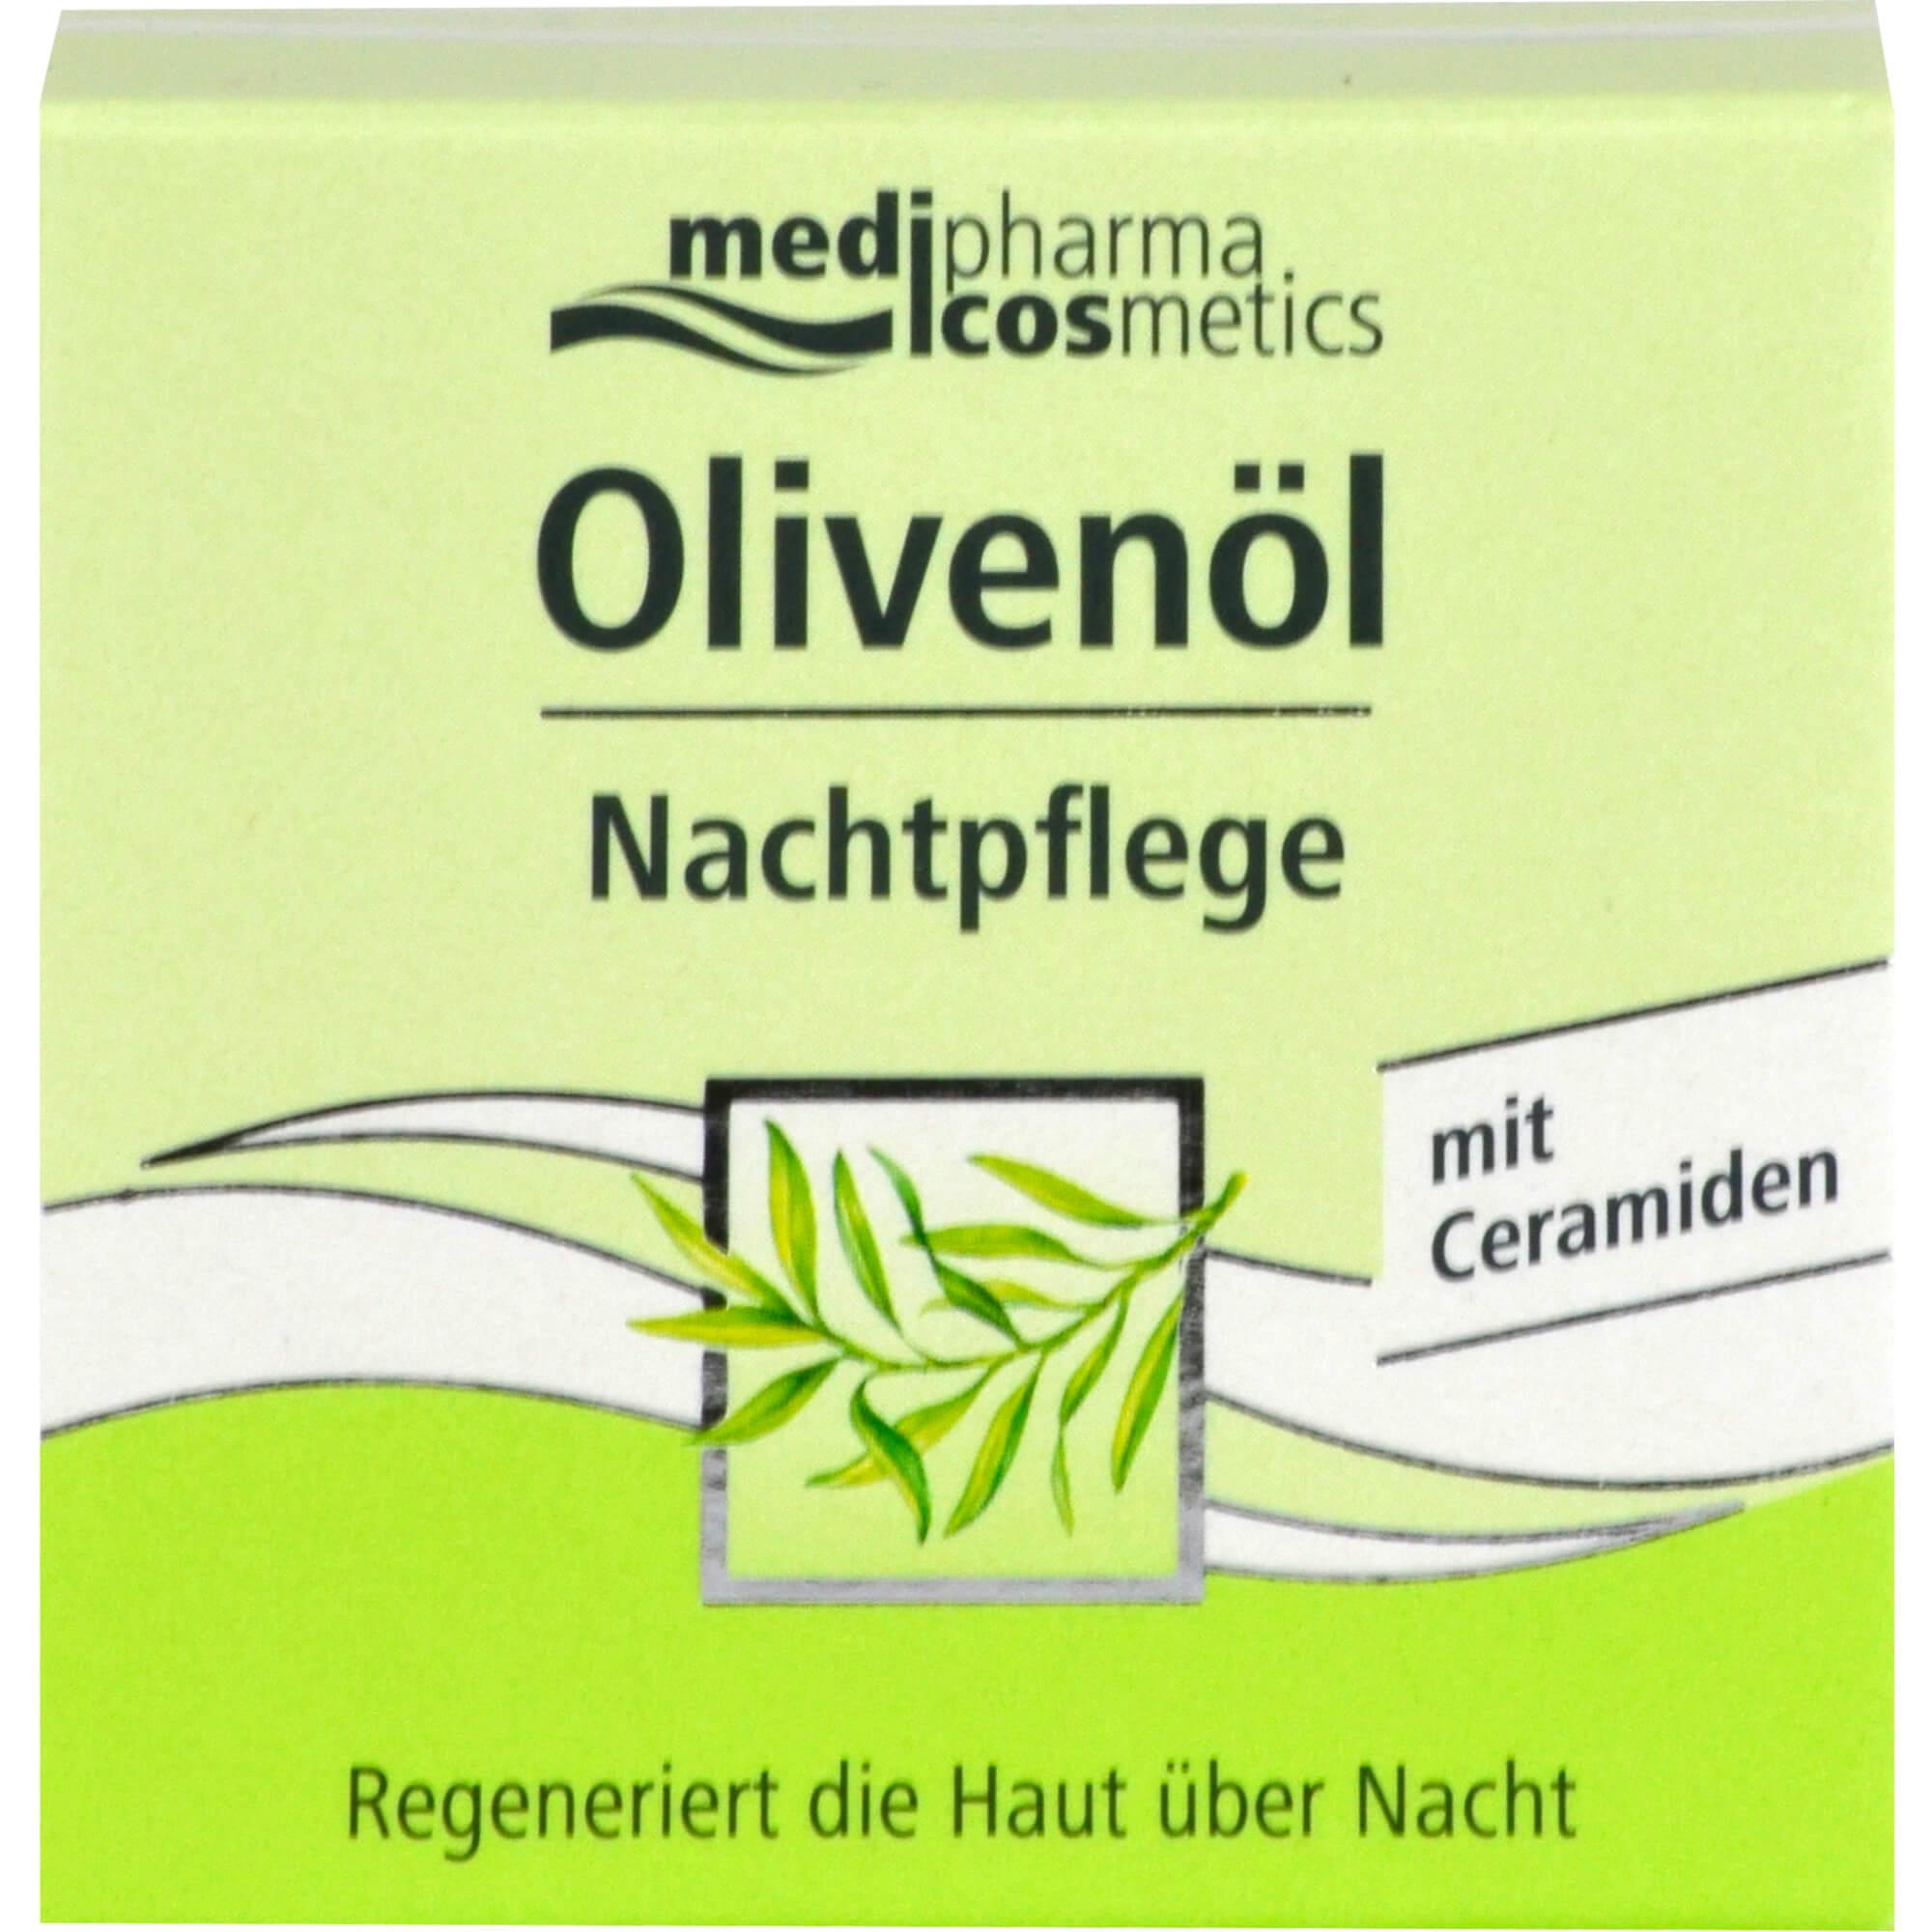 OLIVENOeL-NACHTPFLEGE-Creme